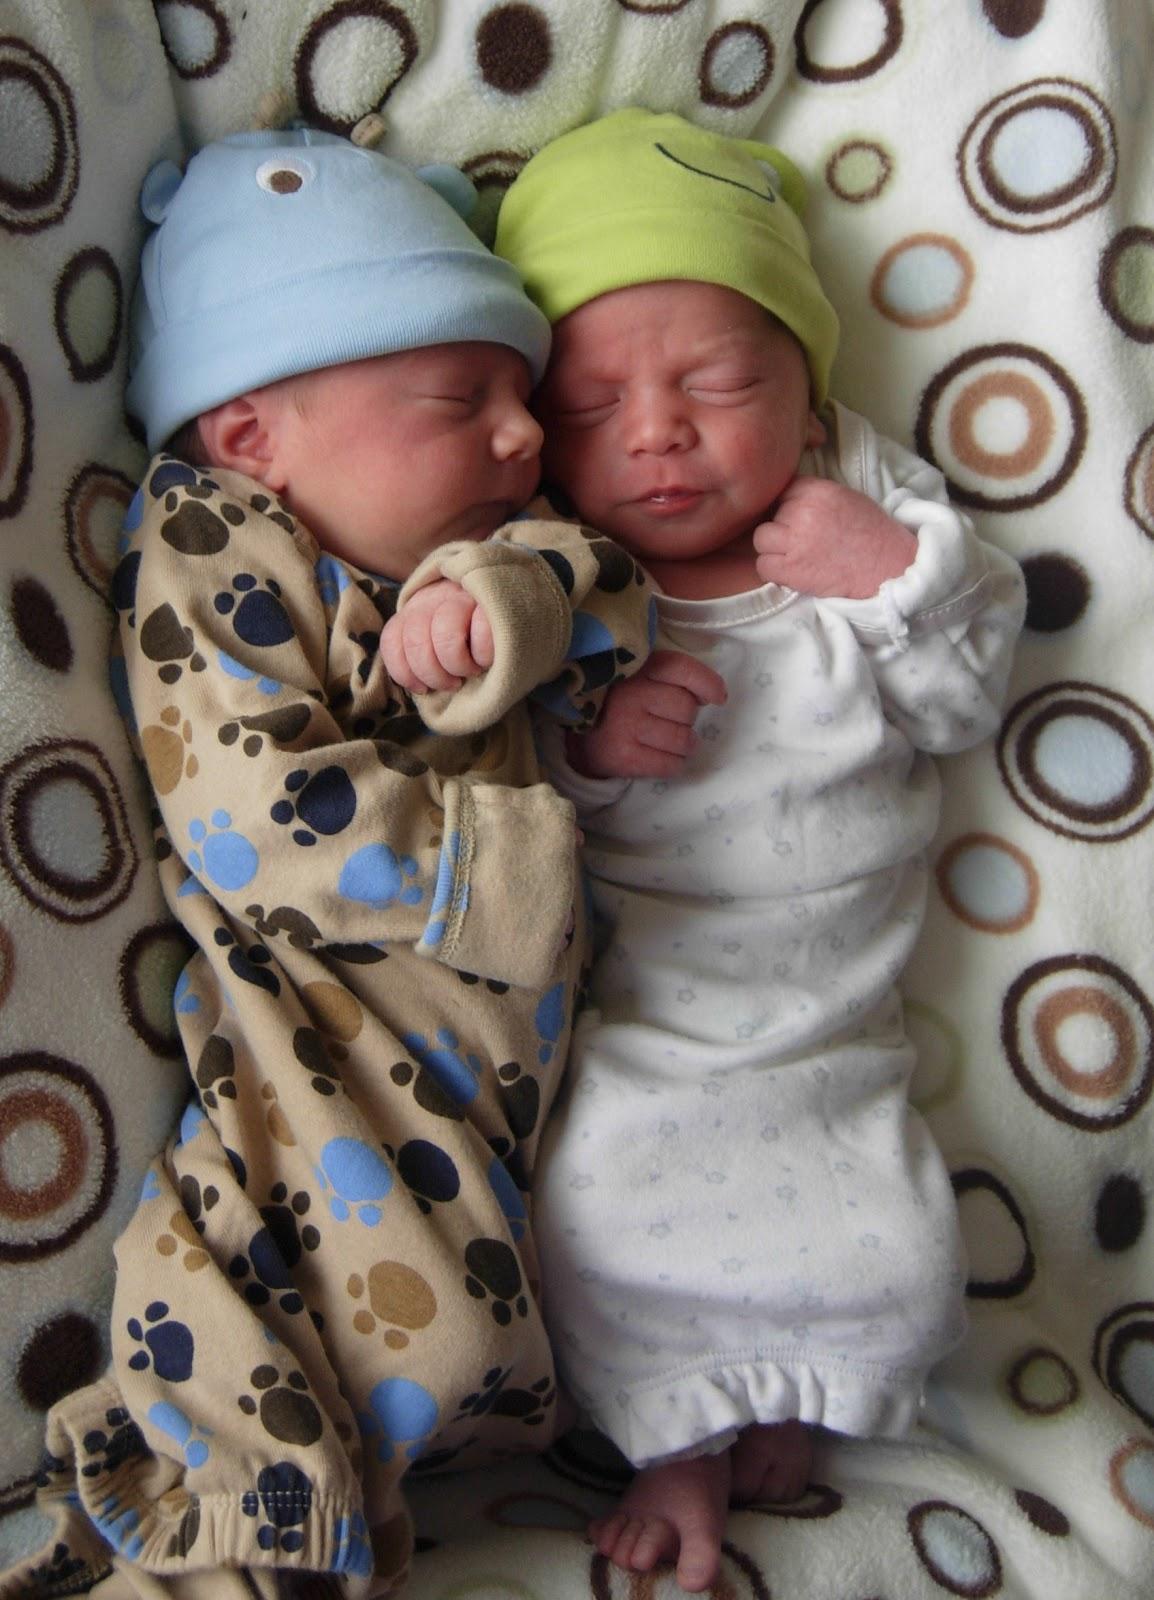 My Three Little Boys: The Inevitability of Loss